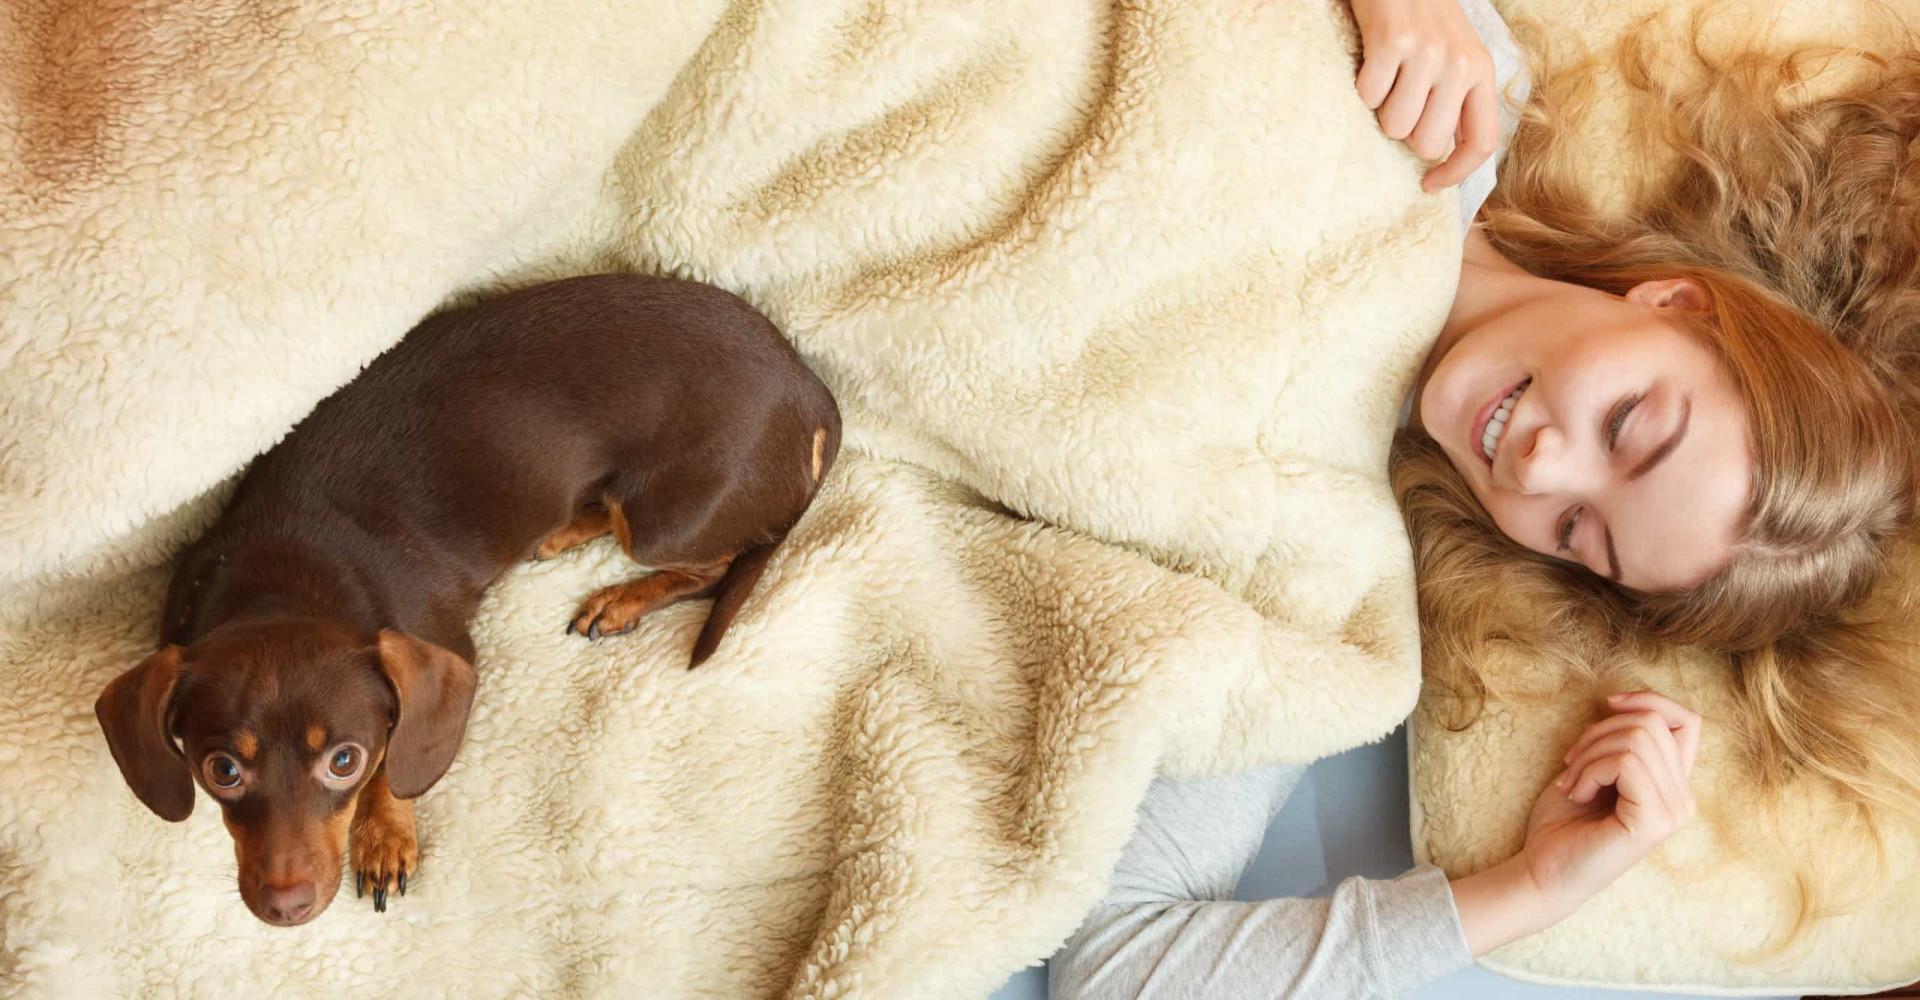 Women sleep better next to dogs than men, study says